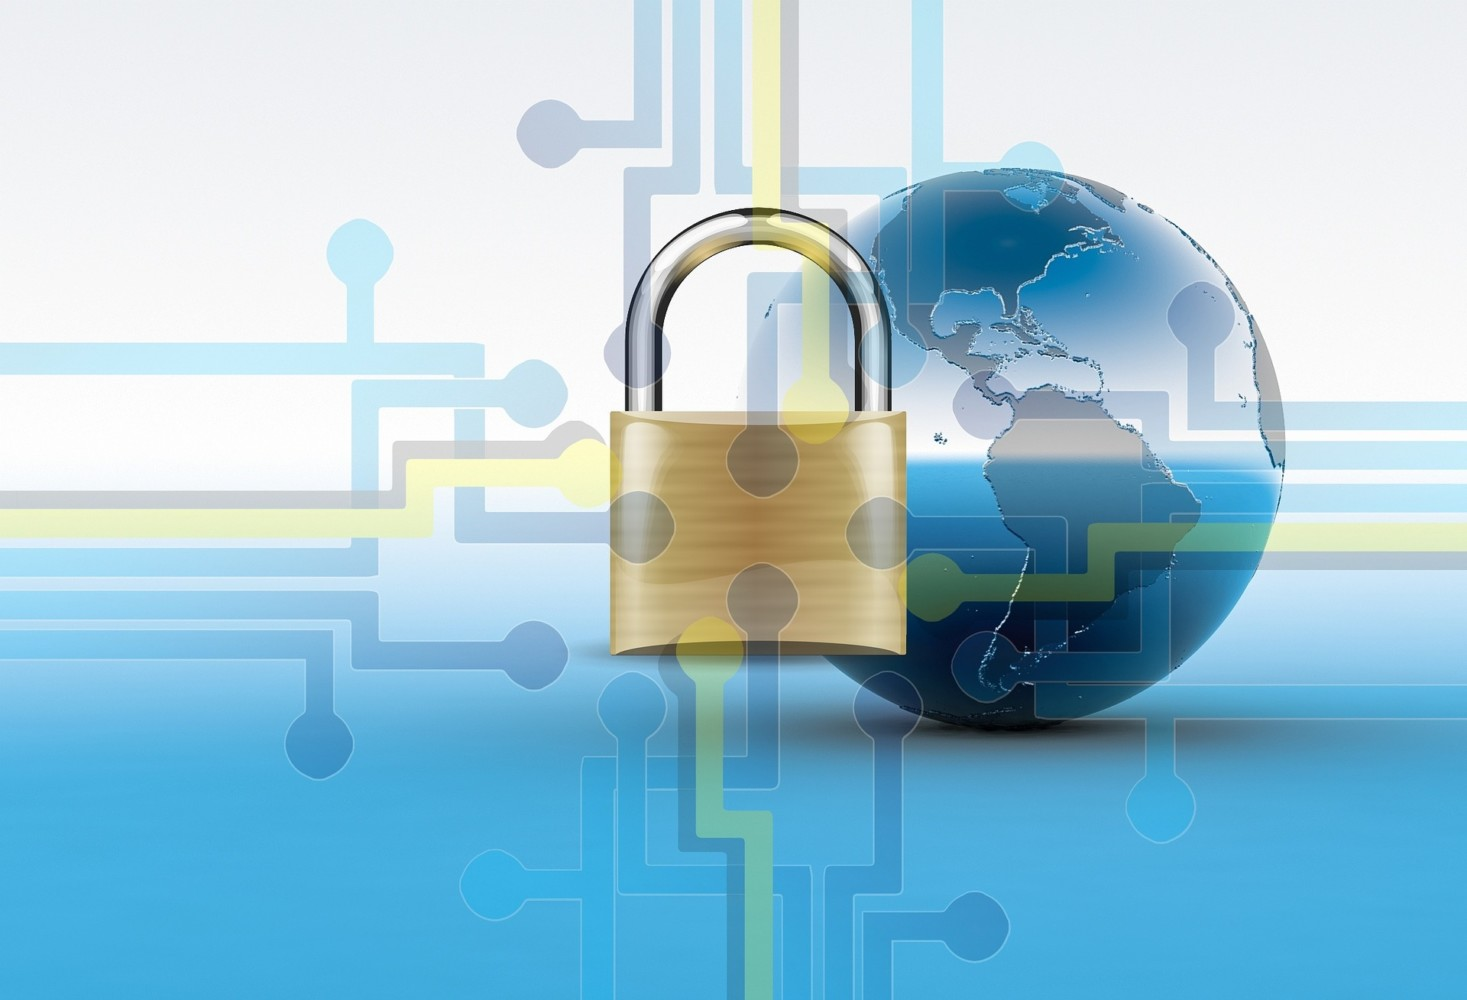 SSlサーバー証明書チェッカー